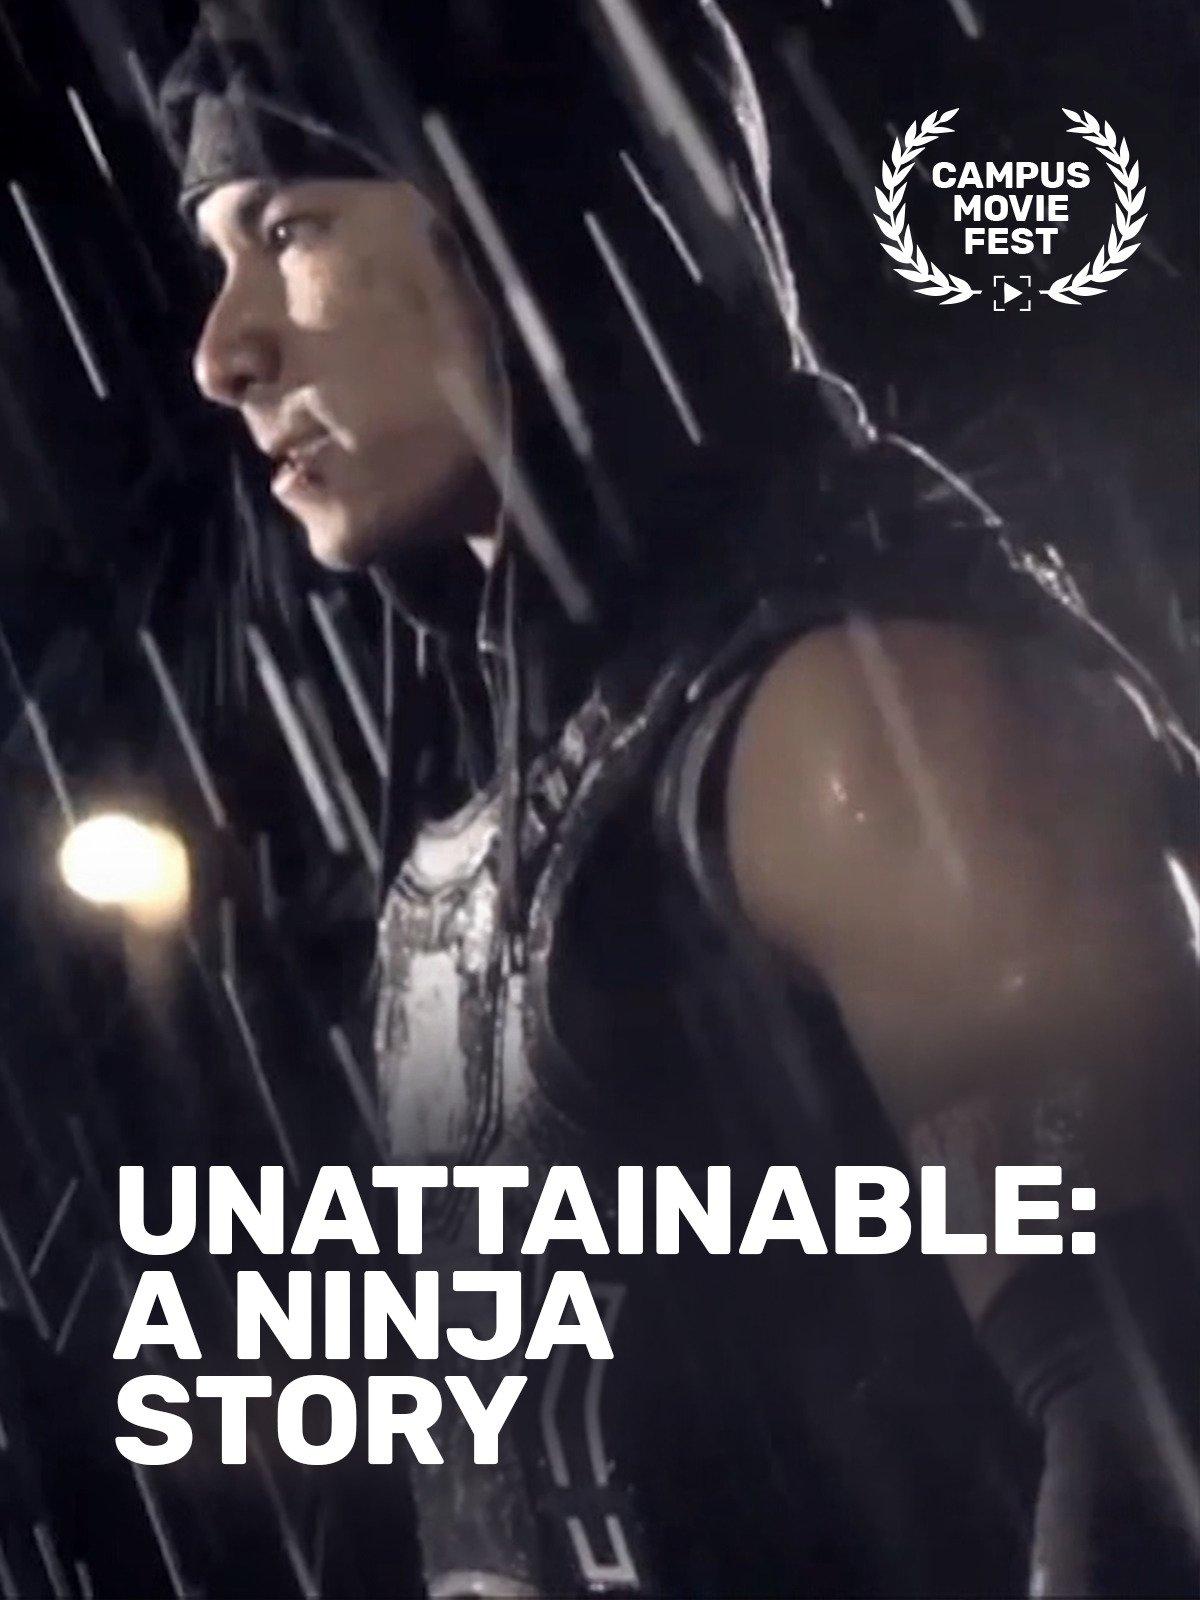 Amazon.com: Watch Unattainable - A Ninja Story | Prime Video